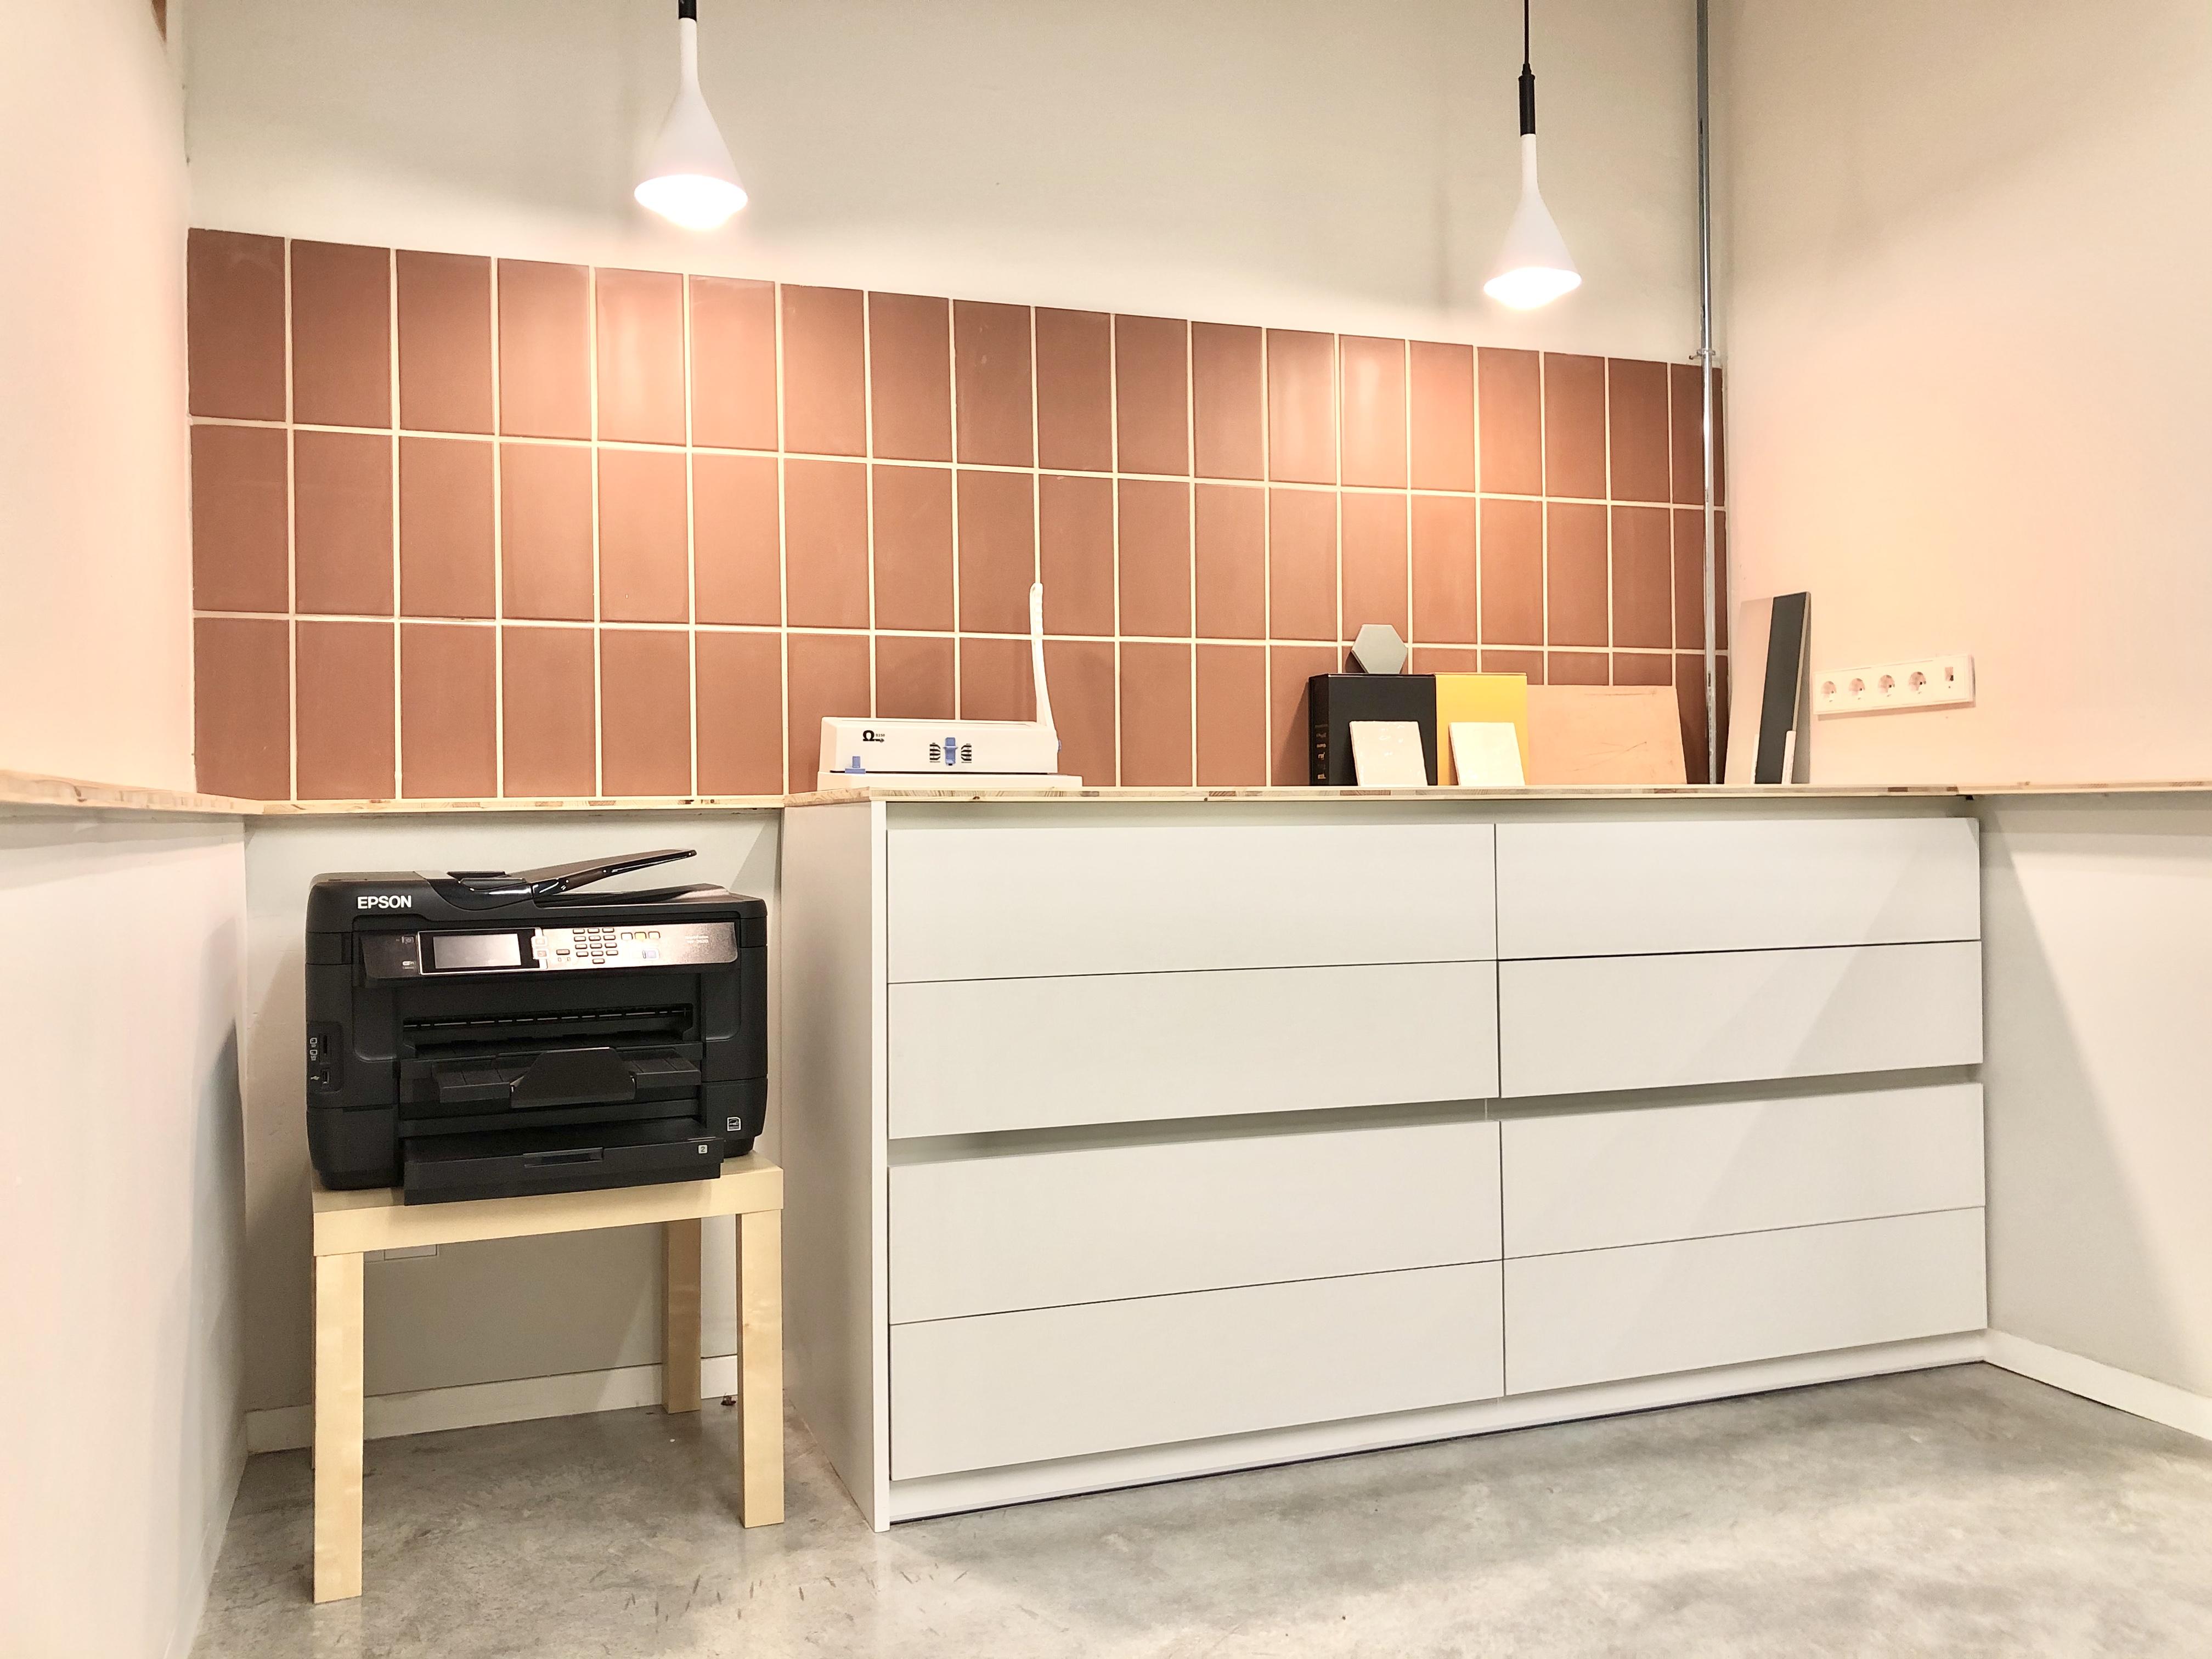 Arquivistes office 5